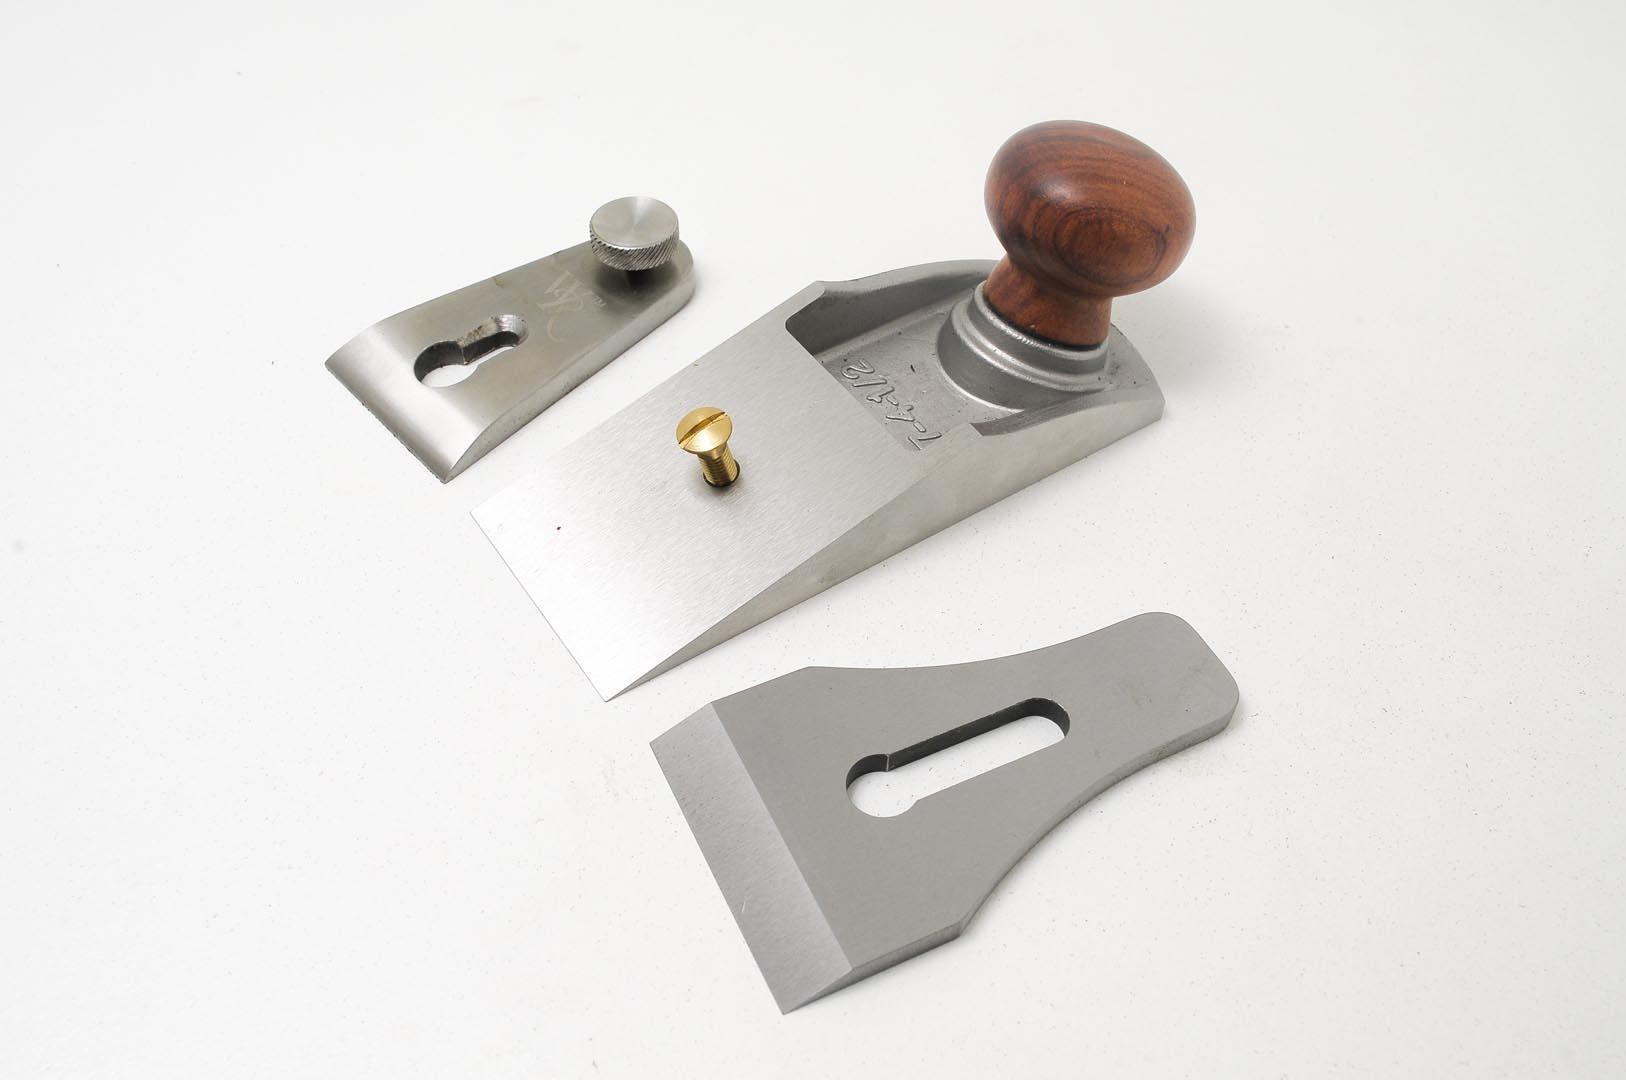 151301-Cepillo de formon pequeño WoodRiver 151301-max-2.